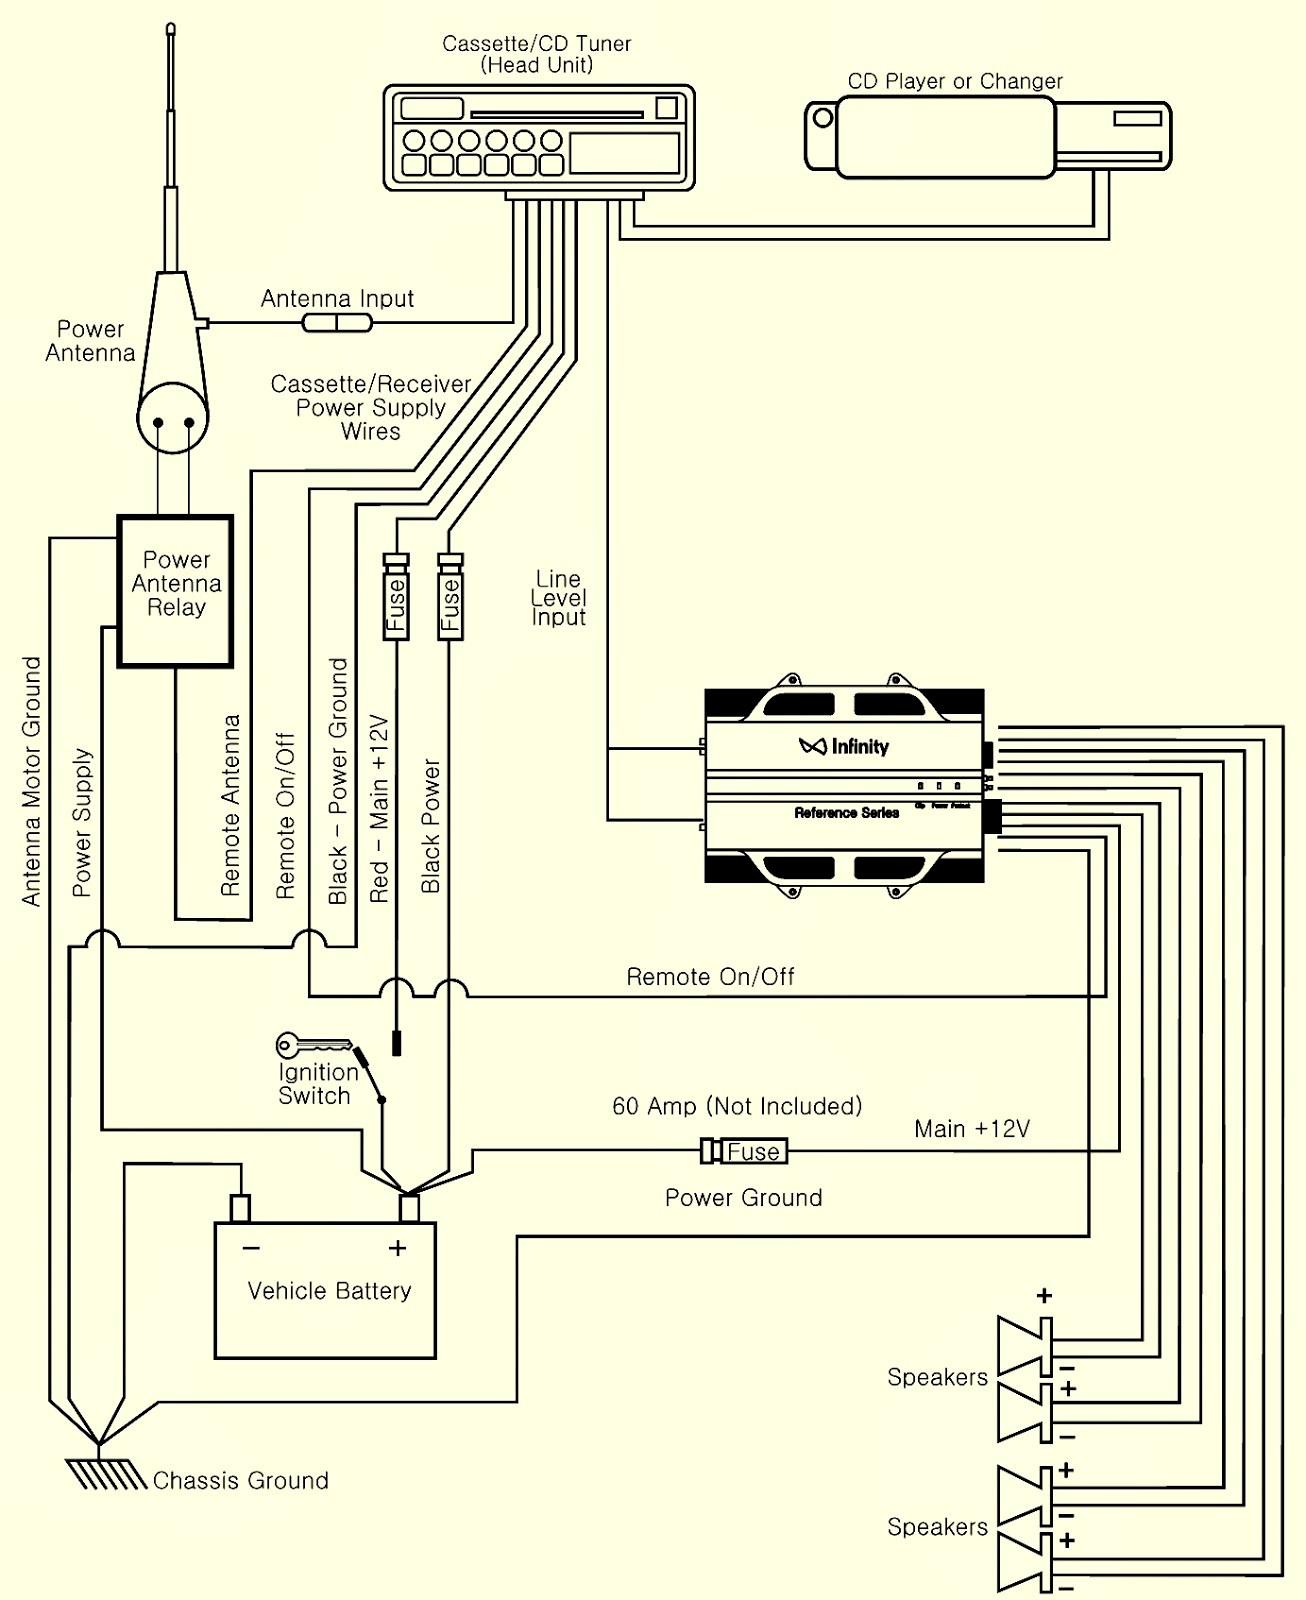 hight resolution of jl audio 12w6v2 wiring diagram free wiring diagram